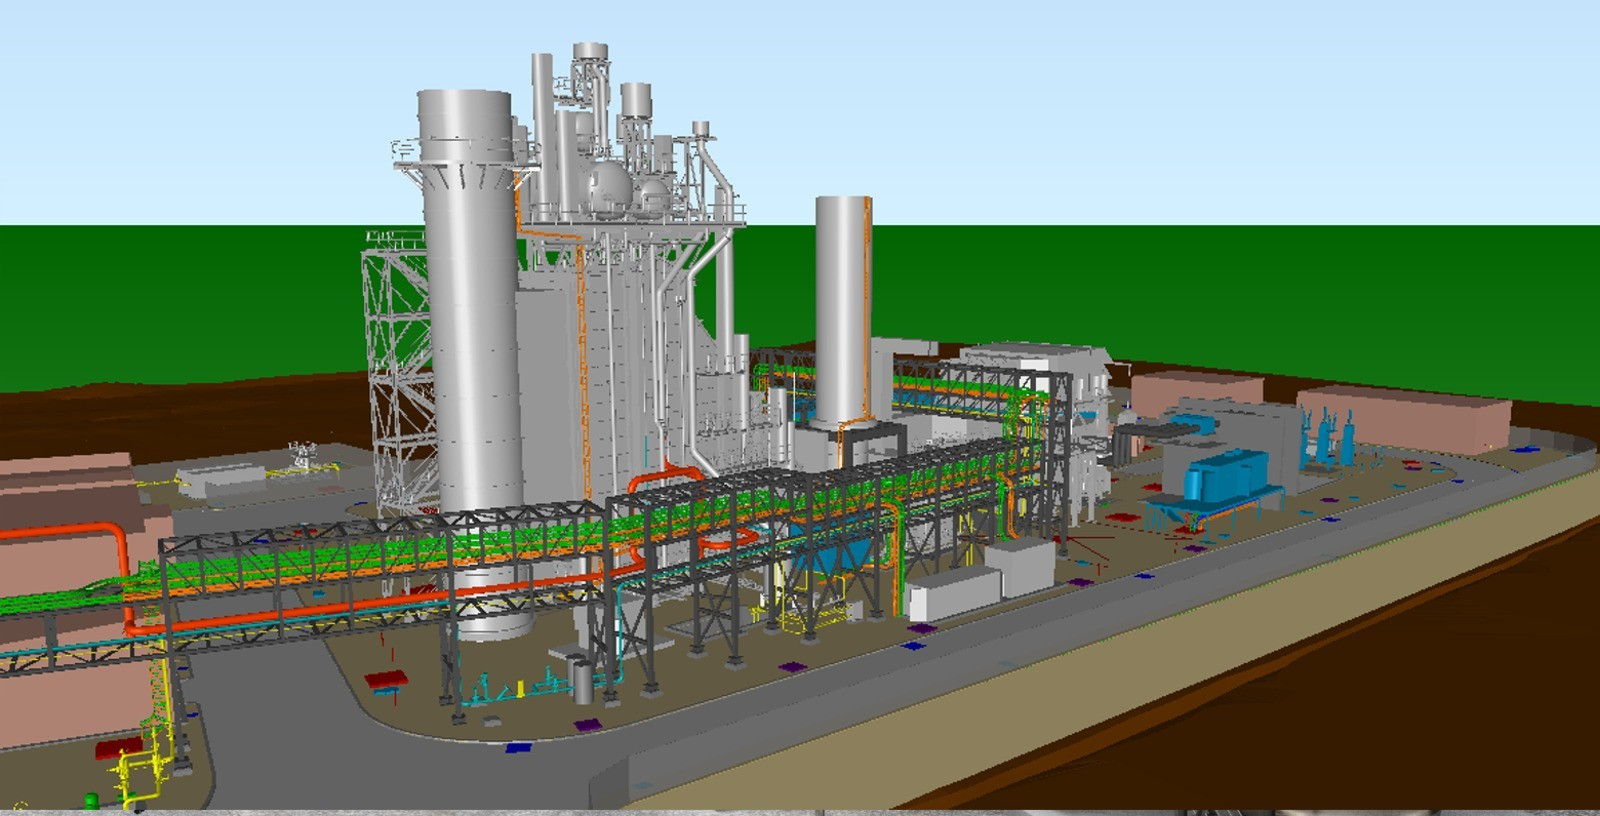 Aconcagua_Cogeneration_CCGT_Concon-Refinery_Duro-Felguera_IDOM_2